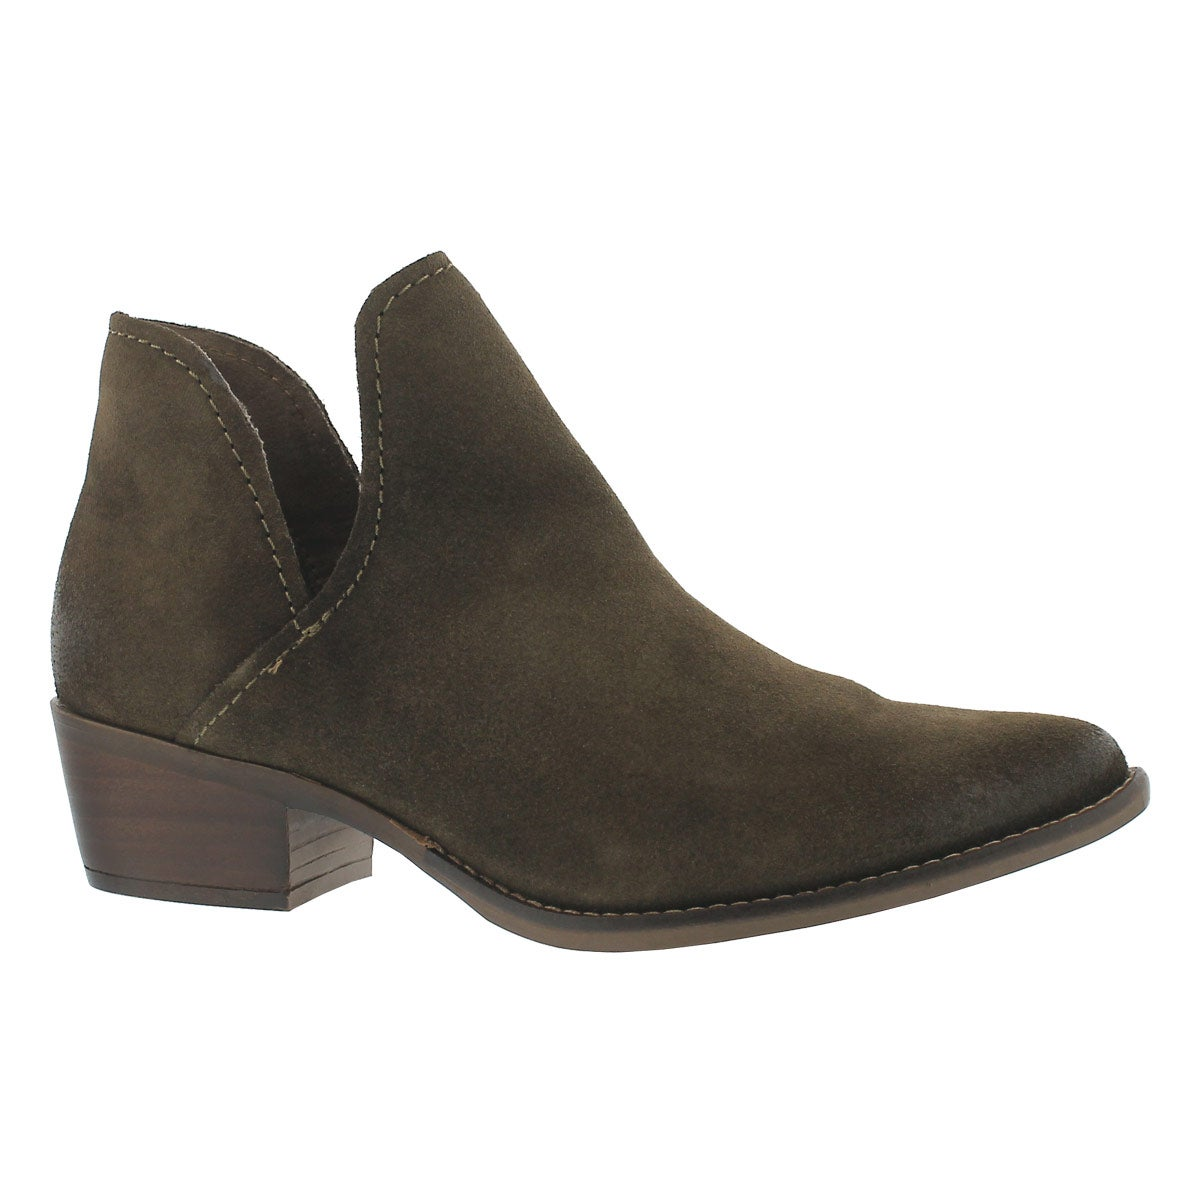 Women's AUSTIN olive slip on ankle boots